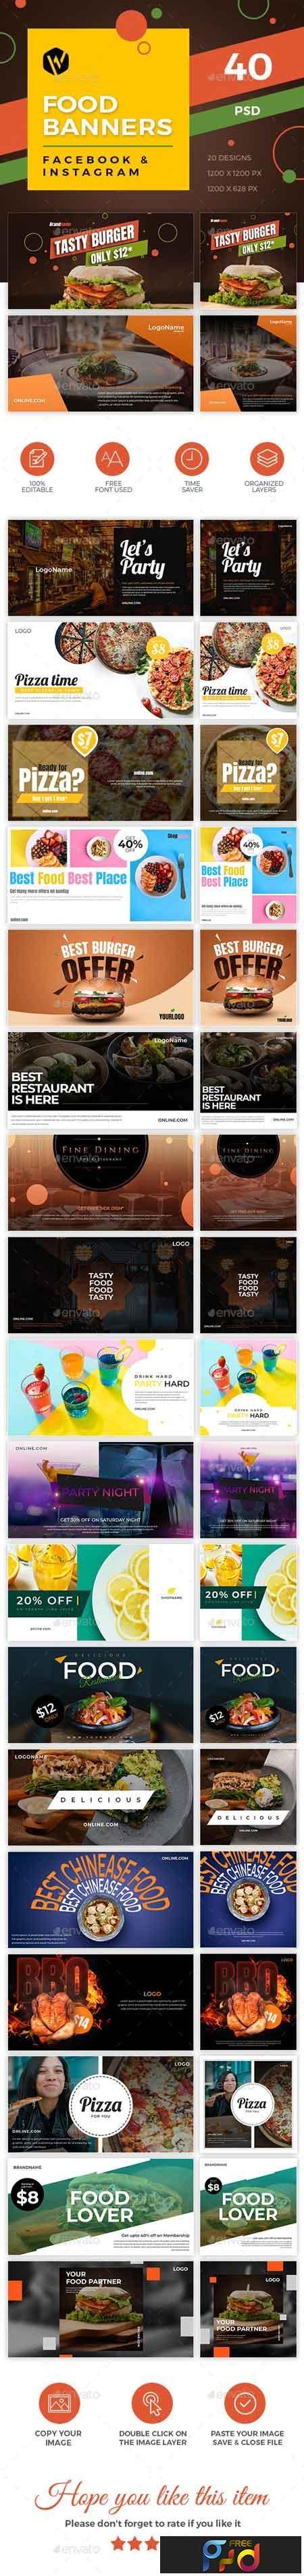 40 Food Banners - Facebook & Instagram 23188414 1